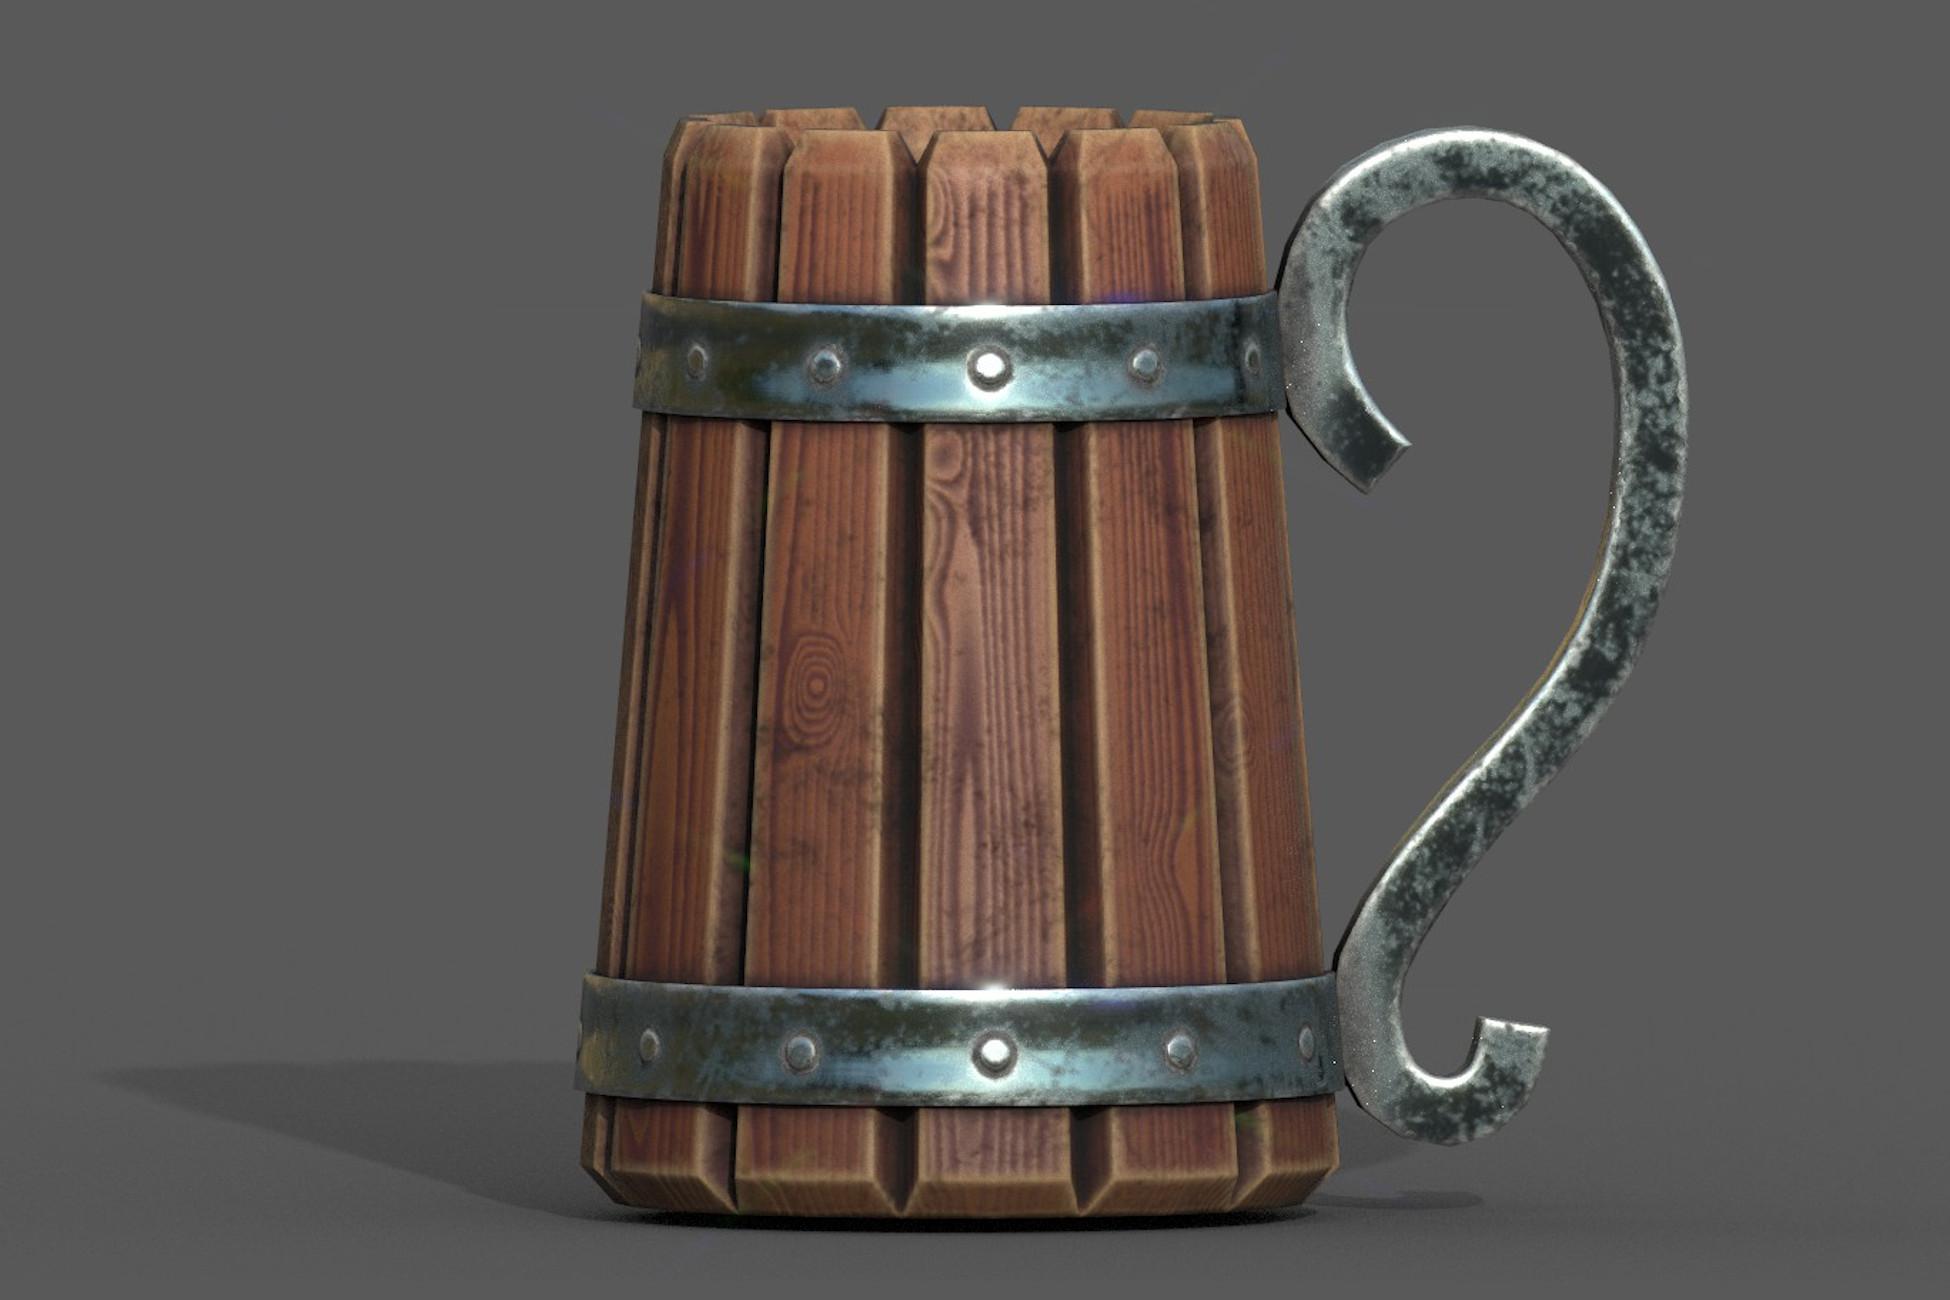 Mug for FREE